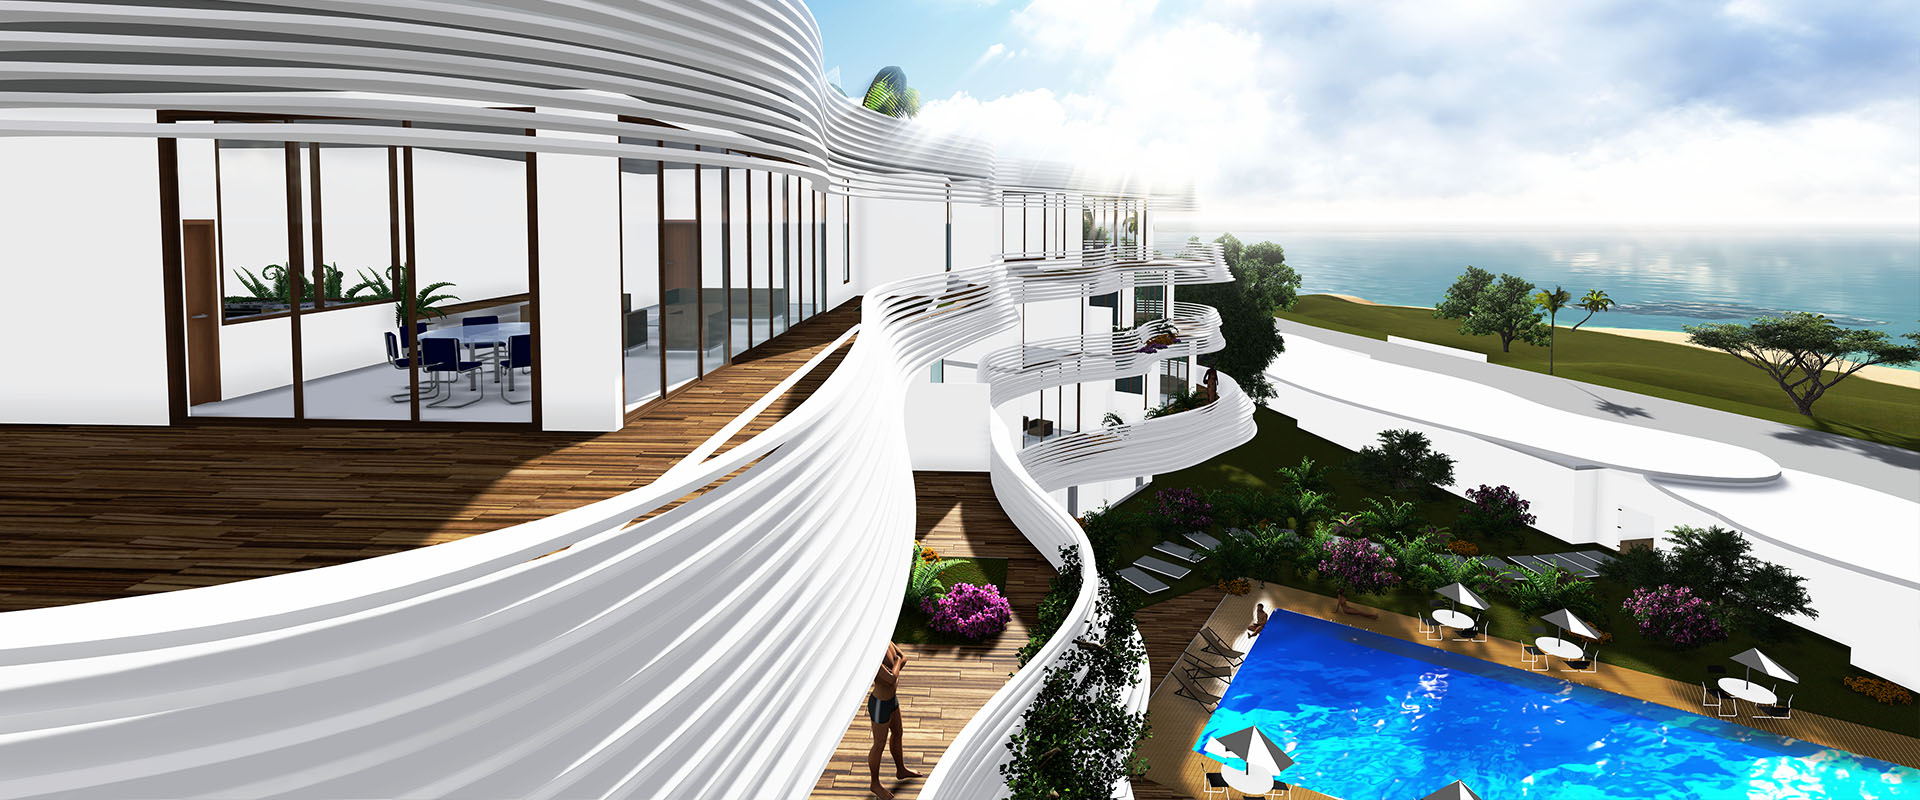 Résidence Grand Large - 1_barla_architectes_kribi_cameroun